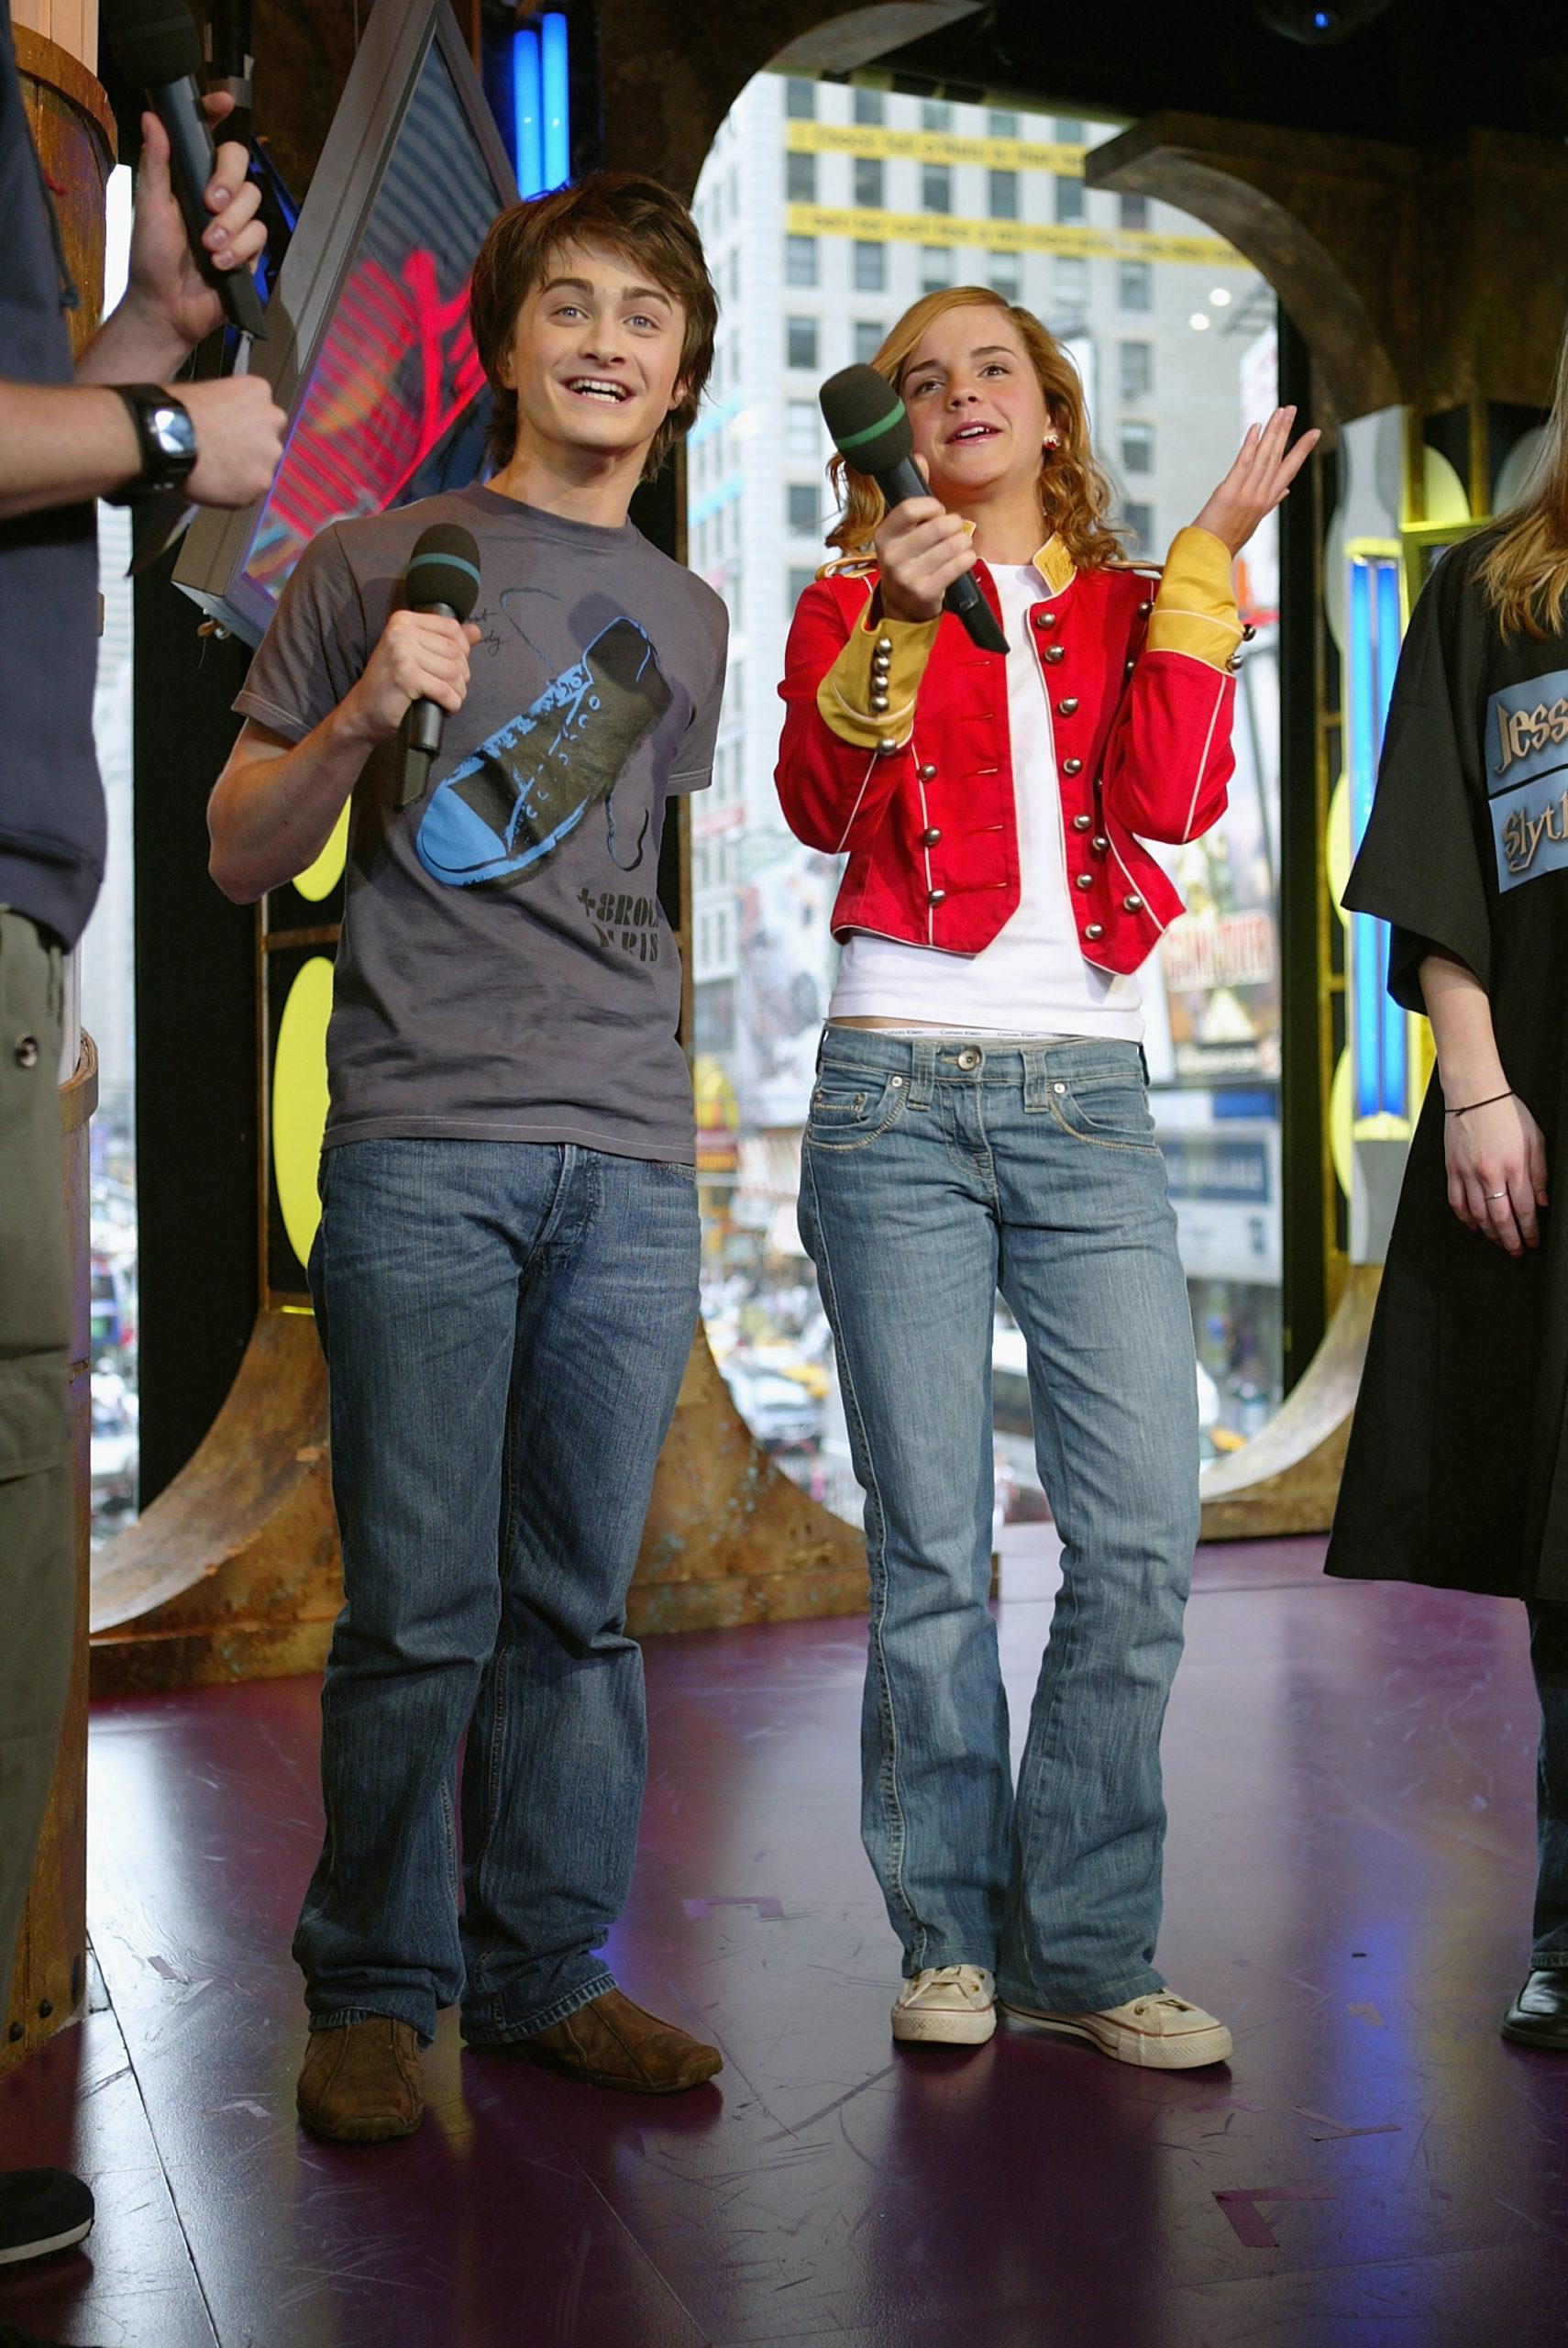 Дэниел Рэдклифф и Эмма Уотсон (2004). Фото: Scott Gries/Getty Images